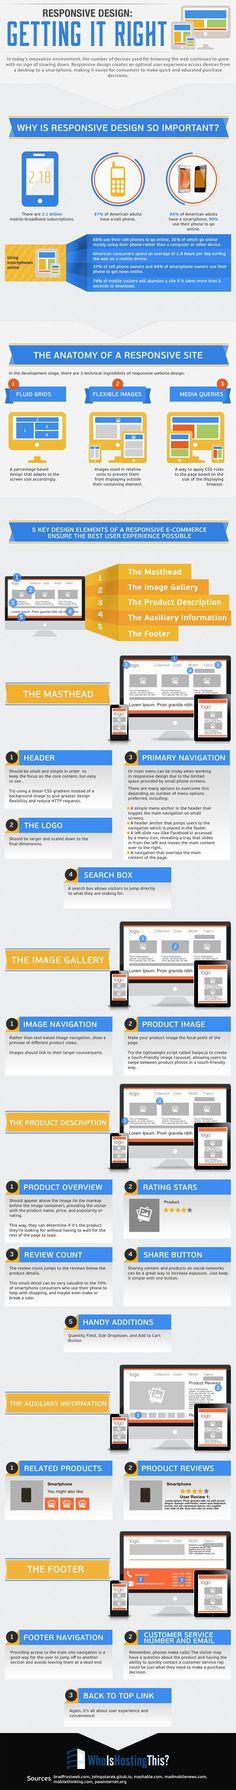 #ResponsiveDesign #Web #Infographic